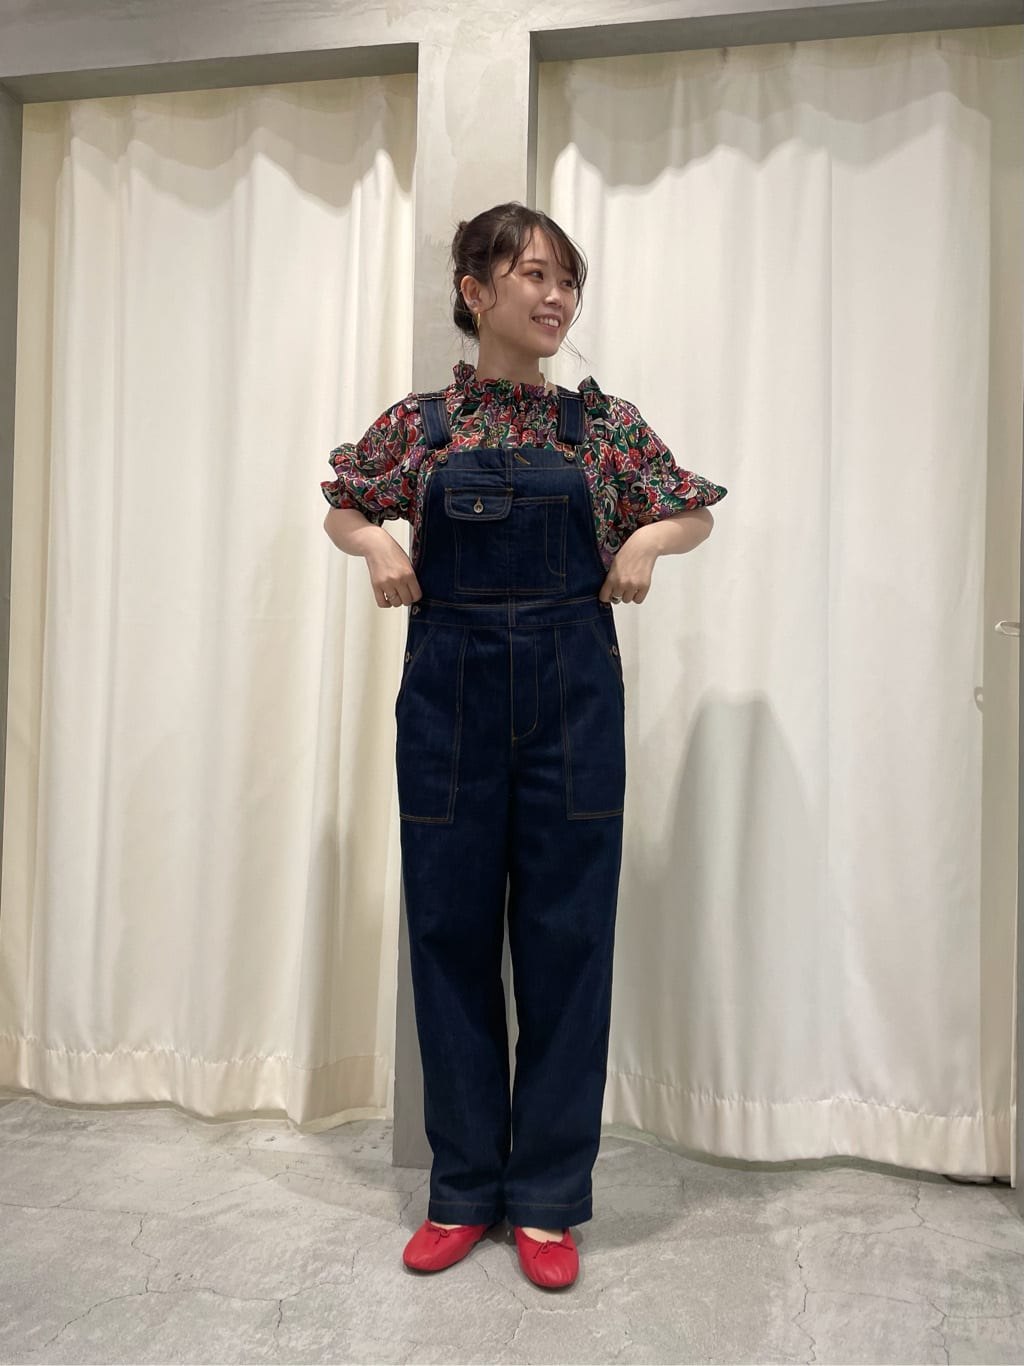 - CHILD WOMAN CHILD WOMAN , PAR ICI ルミネ池袋 身長:157cm 2021.06.29